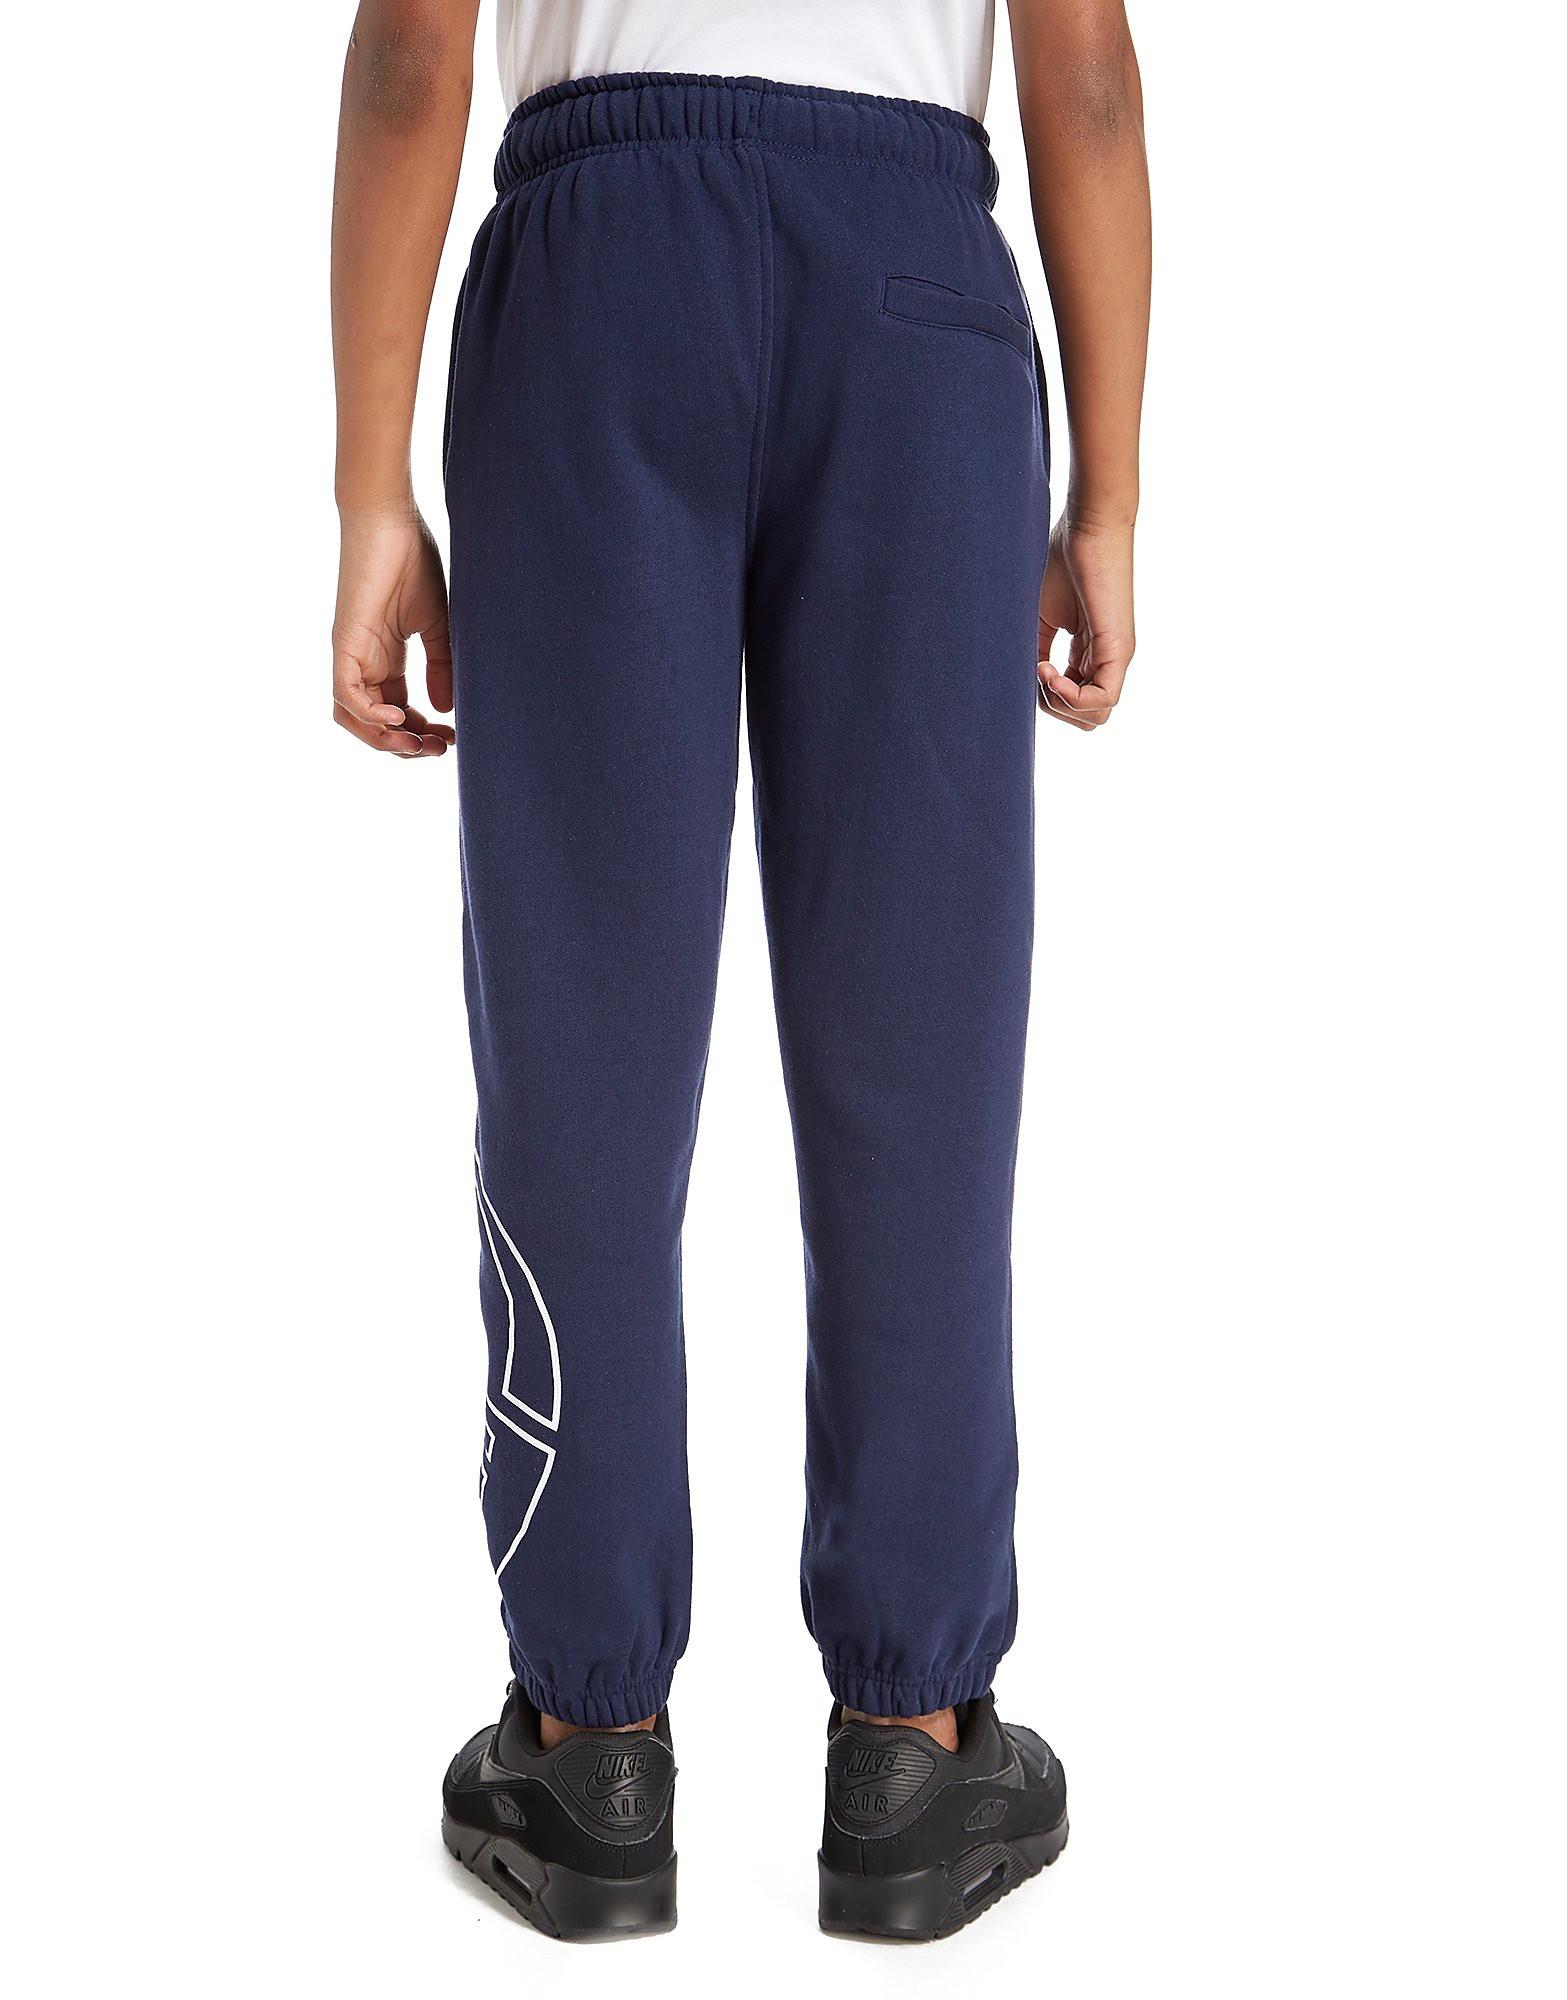 Sergio Tacchini Riley Fleece Pants Junior